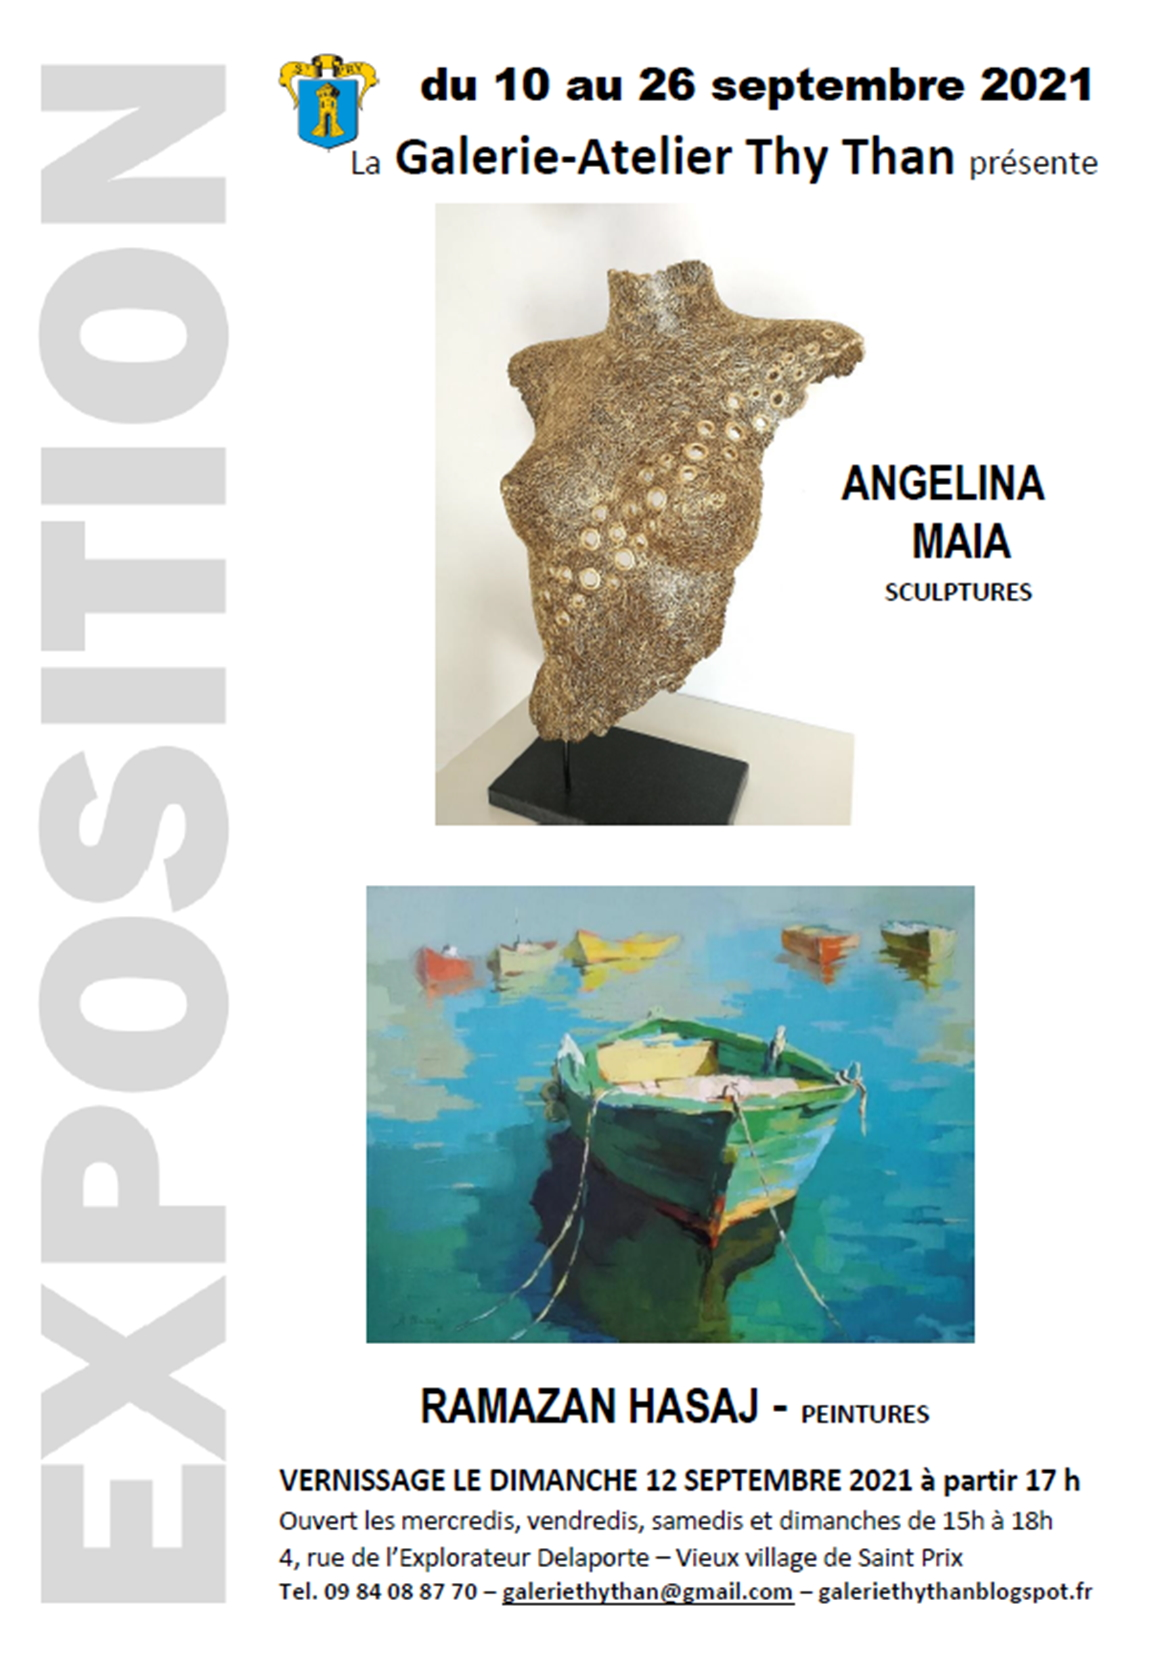 Exposition de Angelina Maia et Ramazan Hasaj